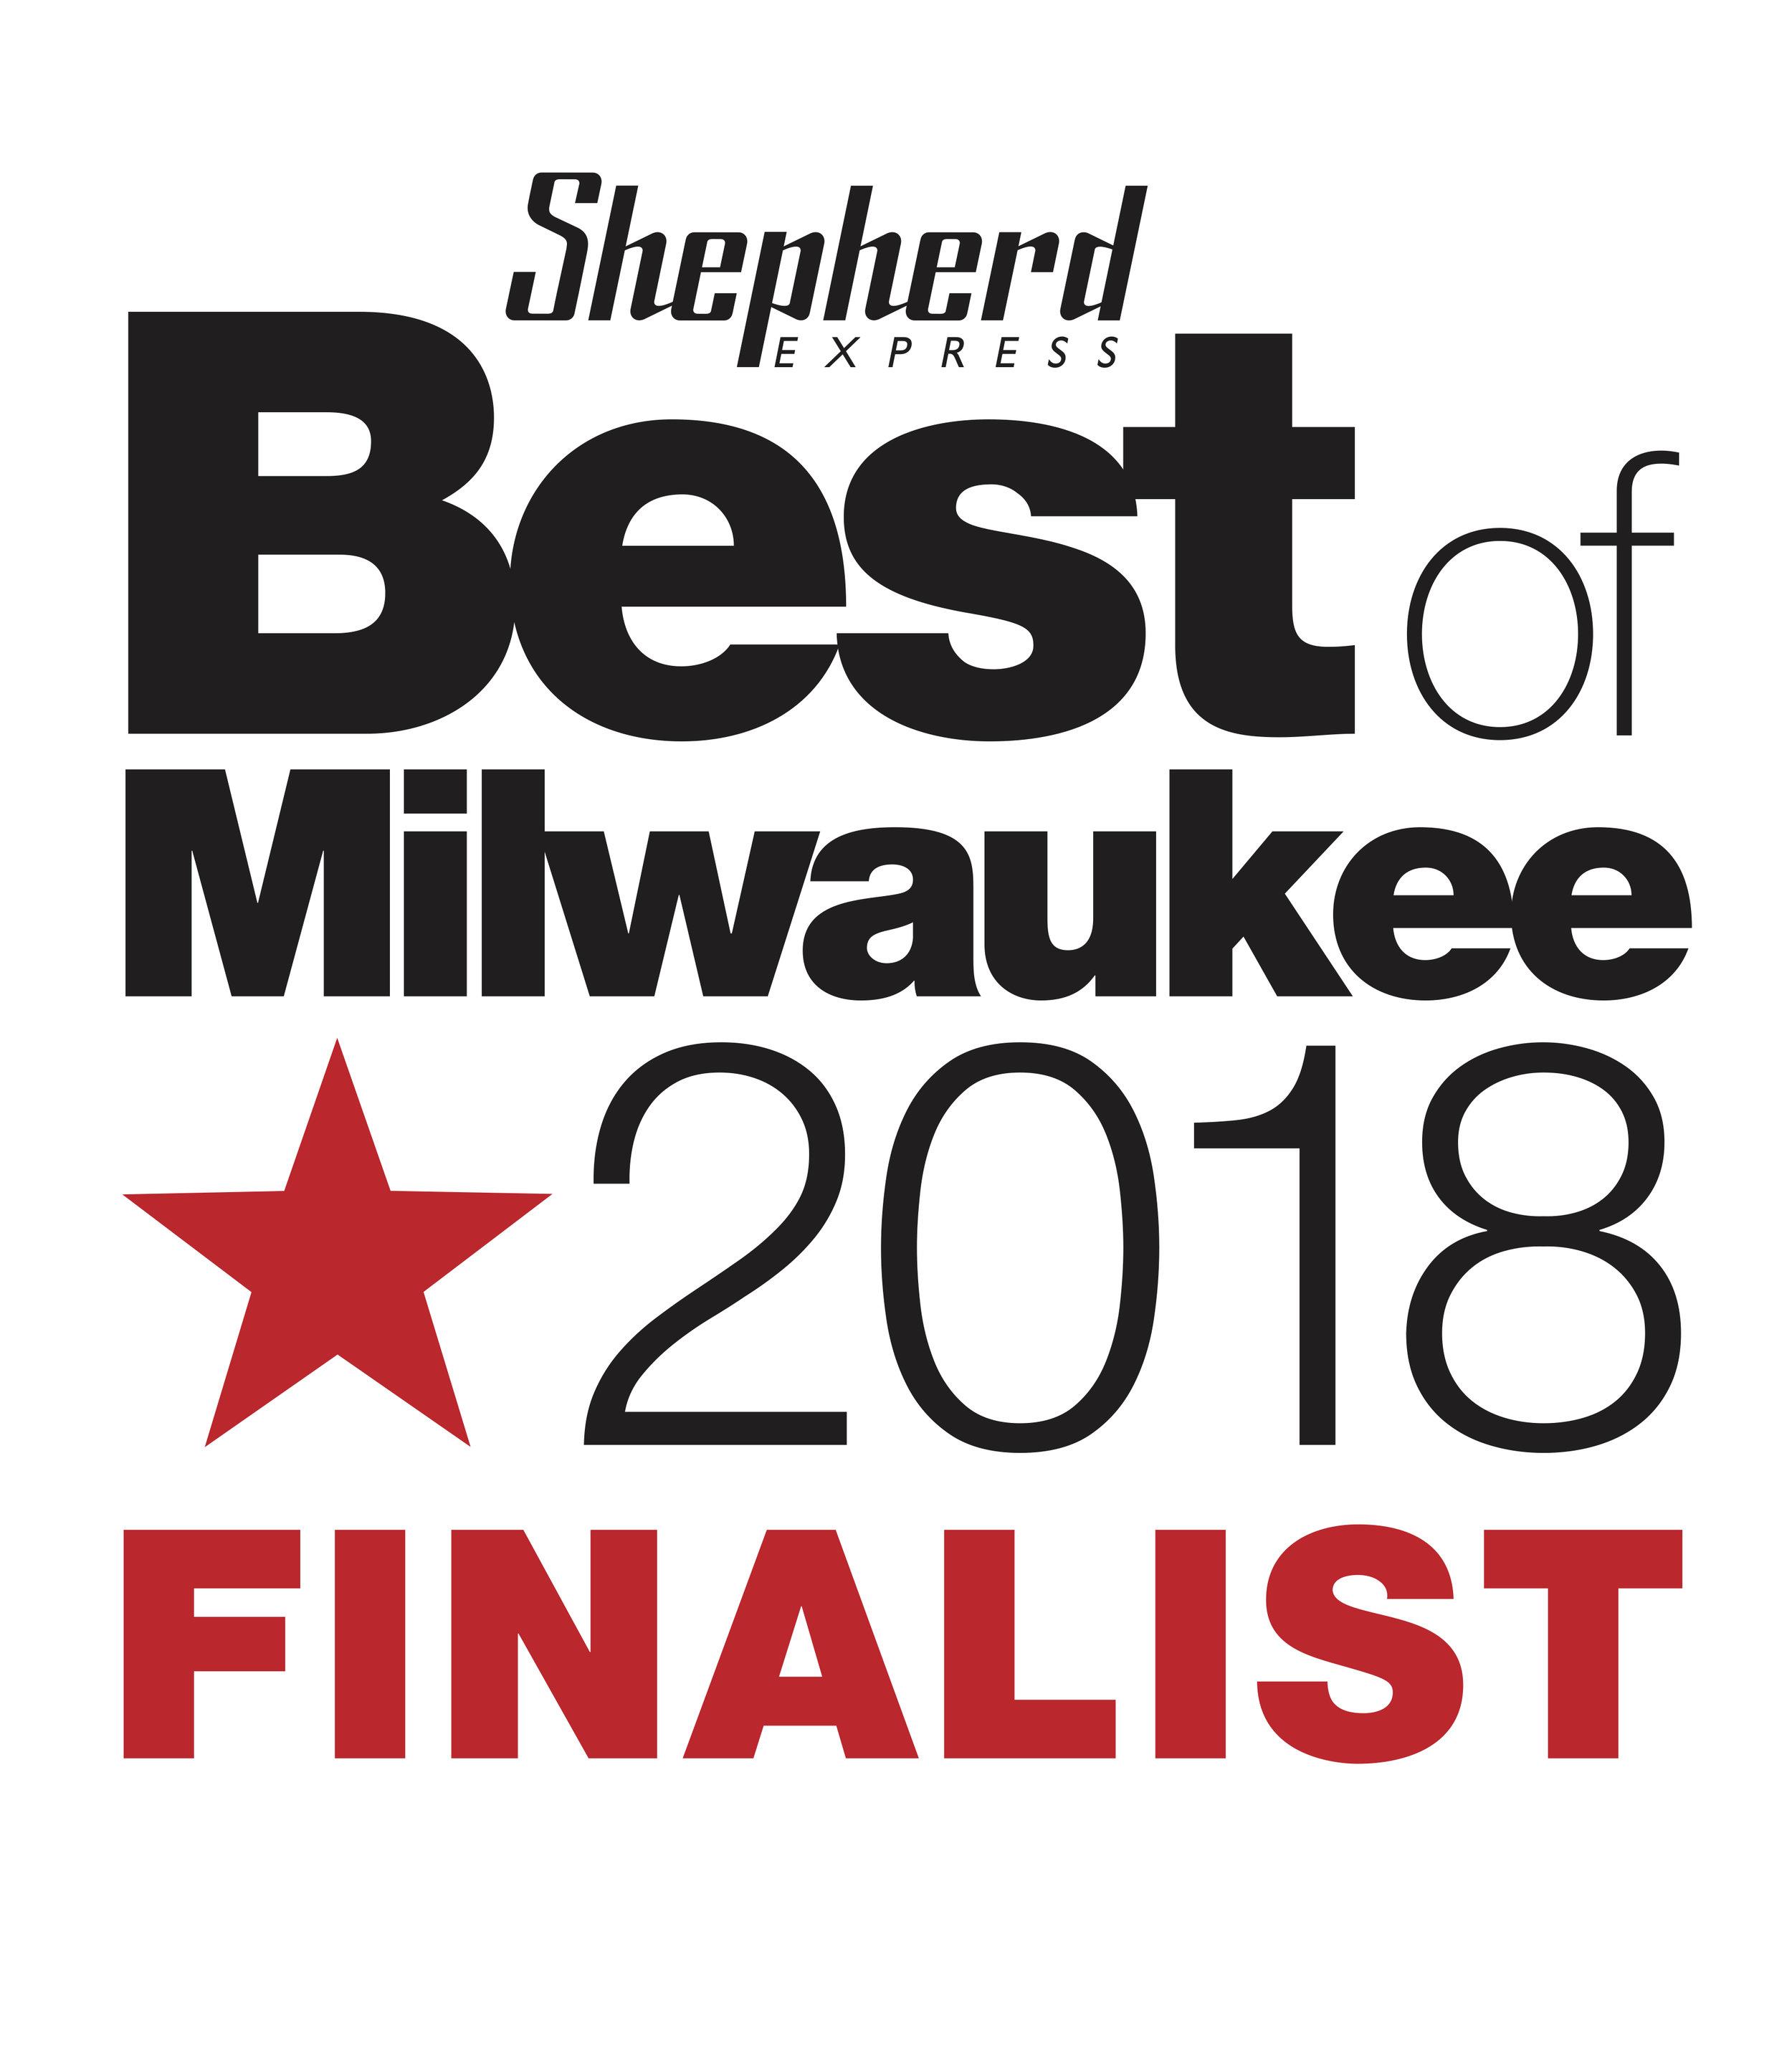 BestOfLogo_2018_finalist.jpg